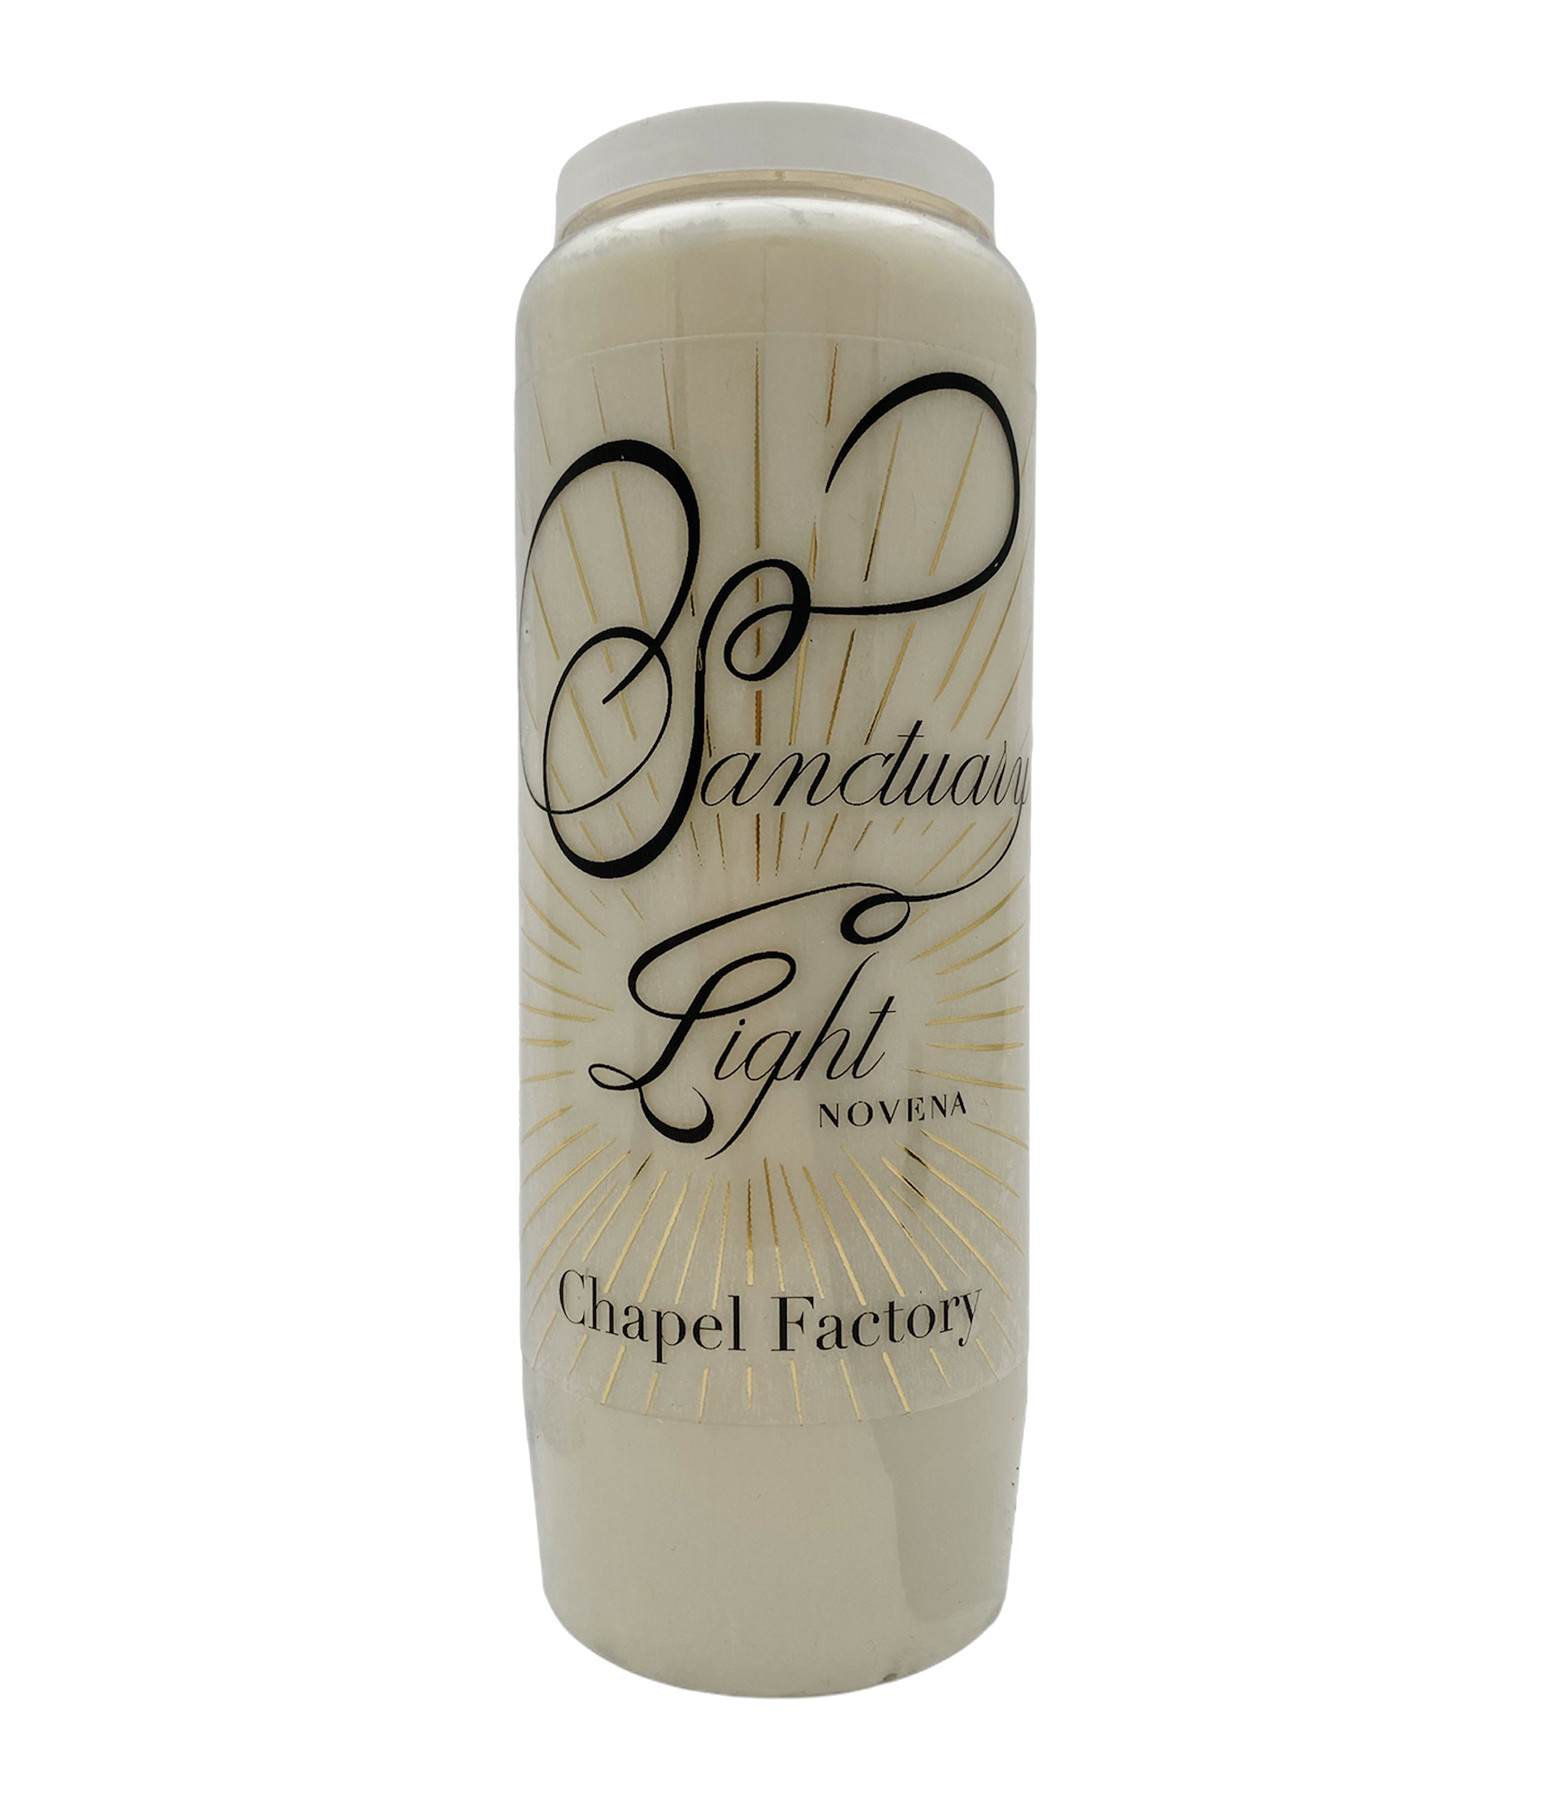 CHAPEL FACTORY - Bougie Novena 500g